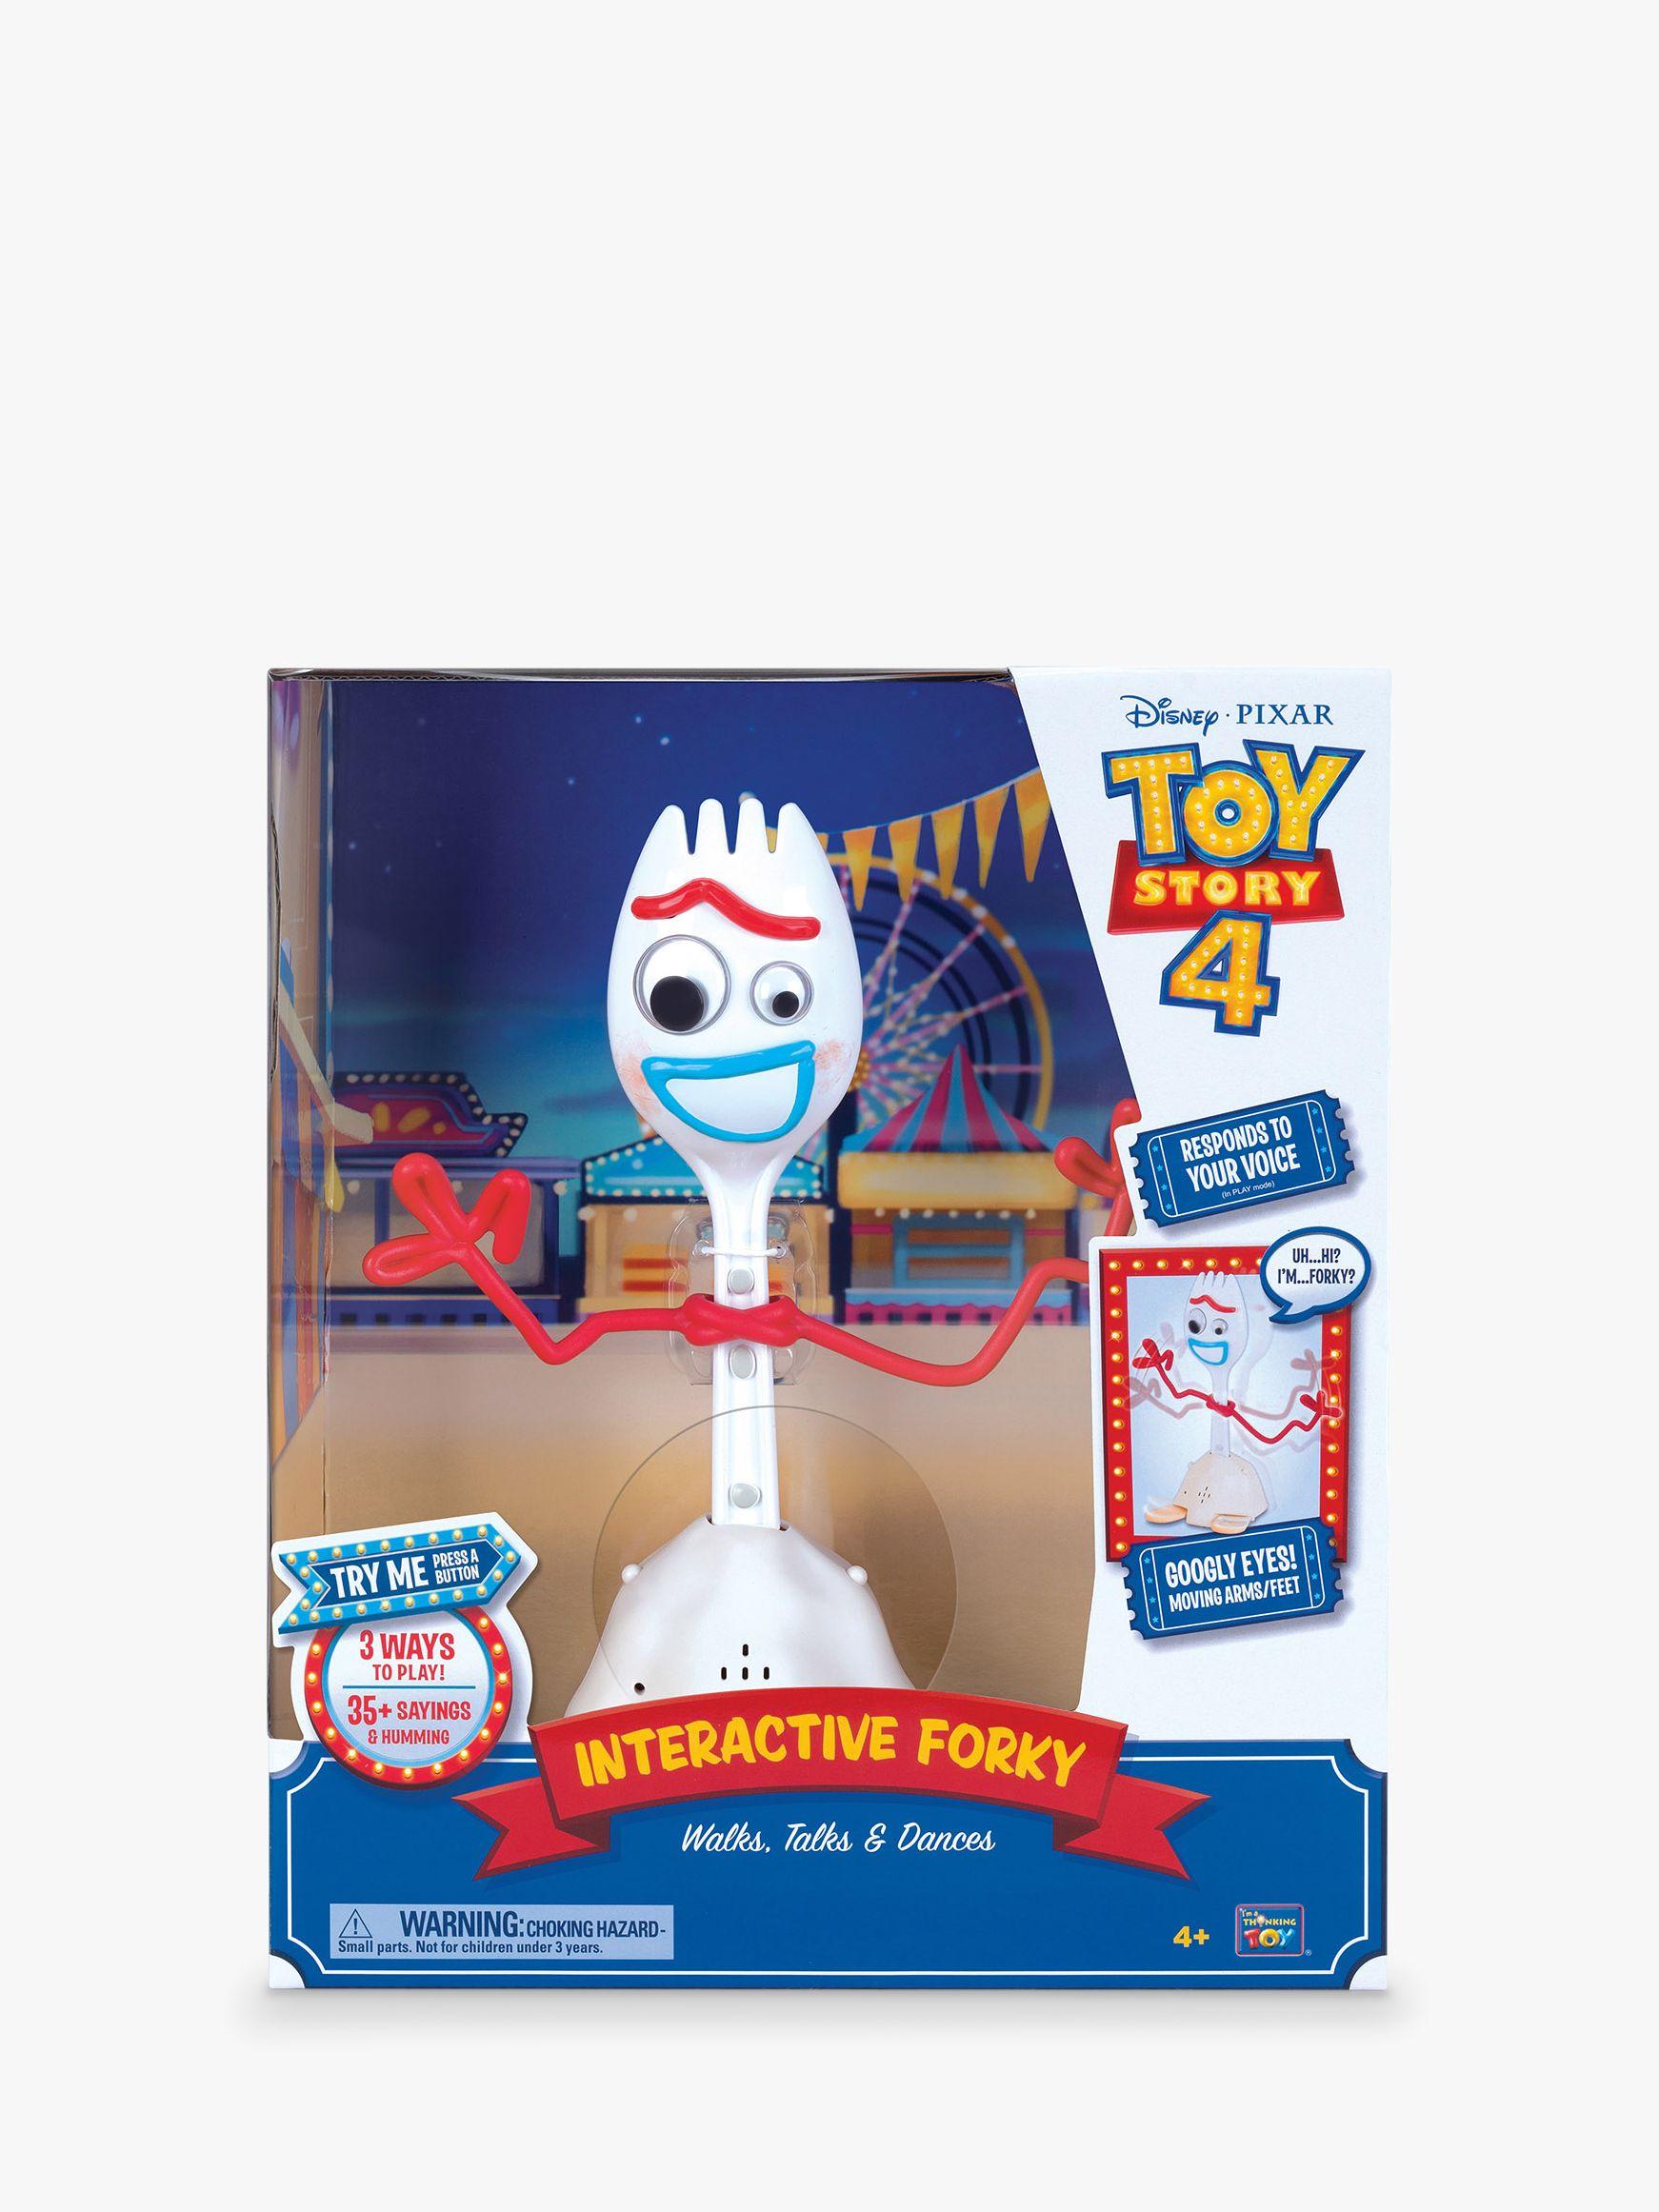 Disney Disney Pixar Toy Story 4 Forky Interactive Toy